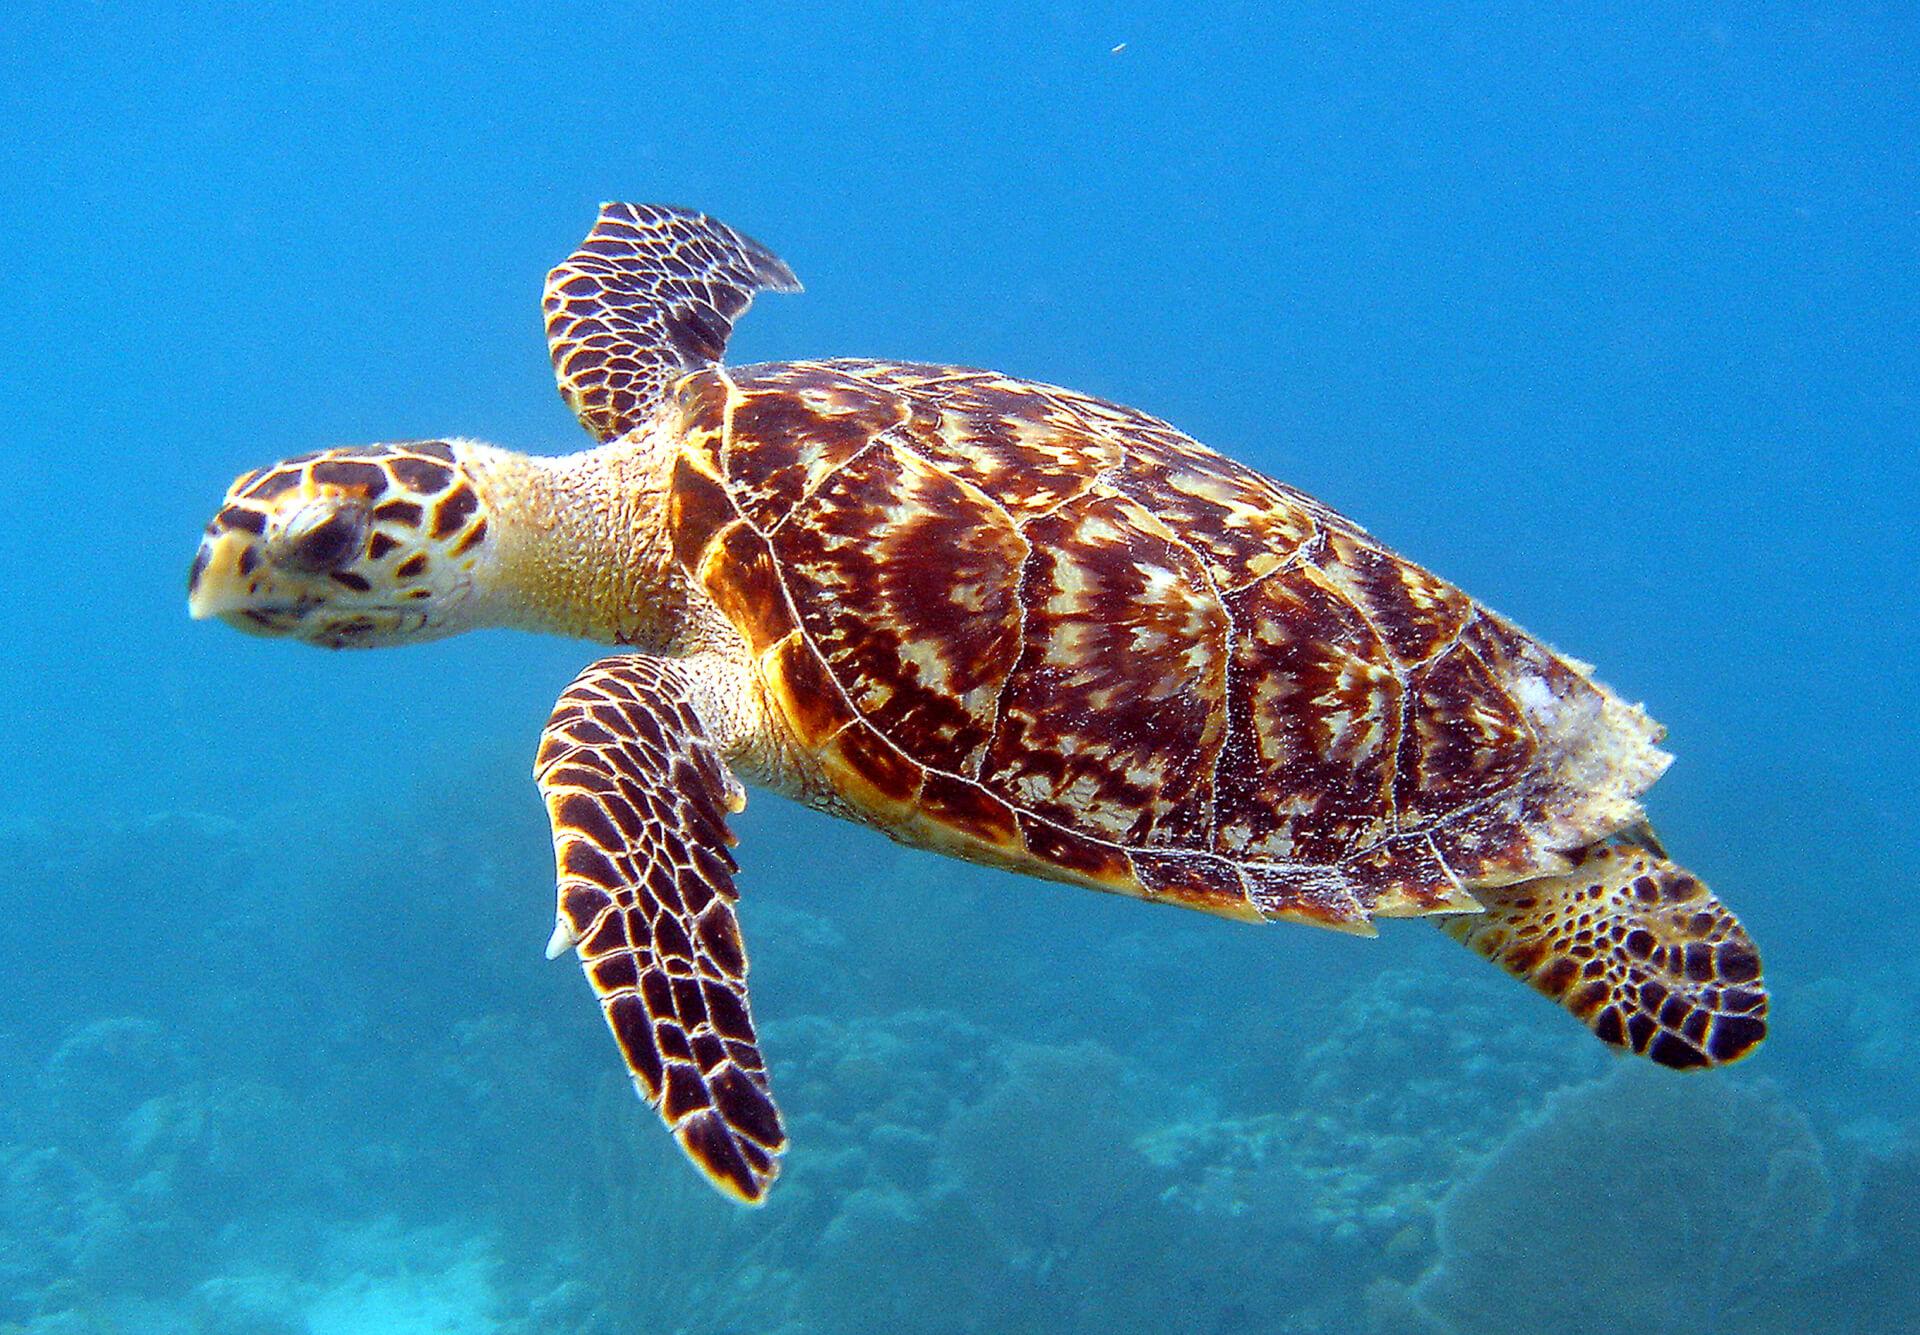 Endangered Species to Get a Reprieve Under Biden Administration Plans